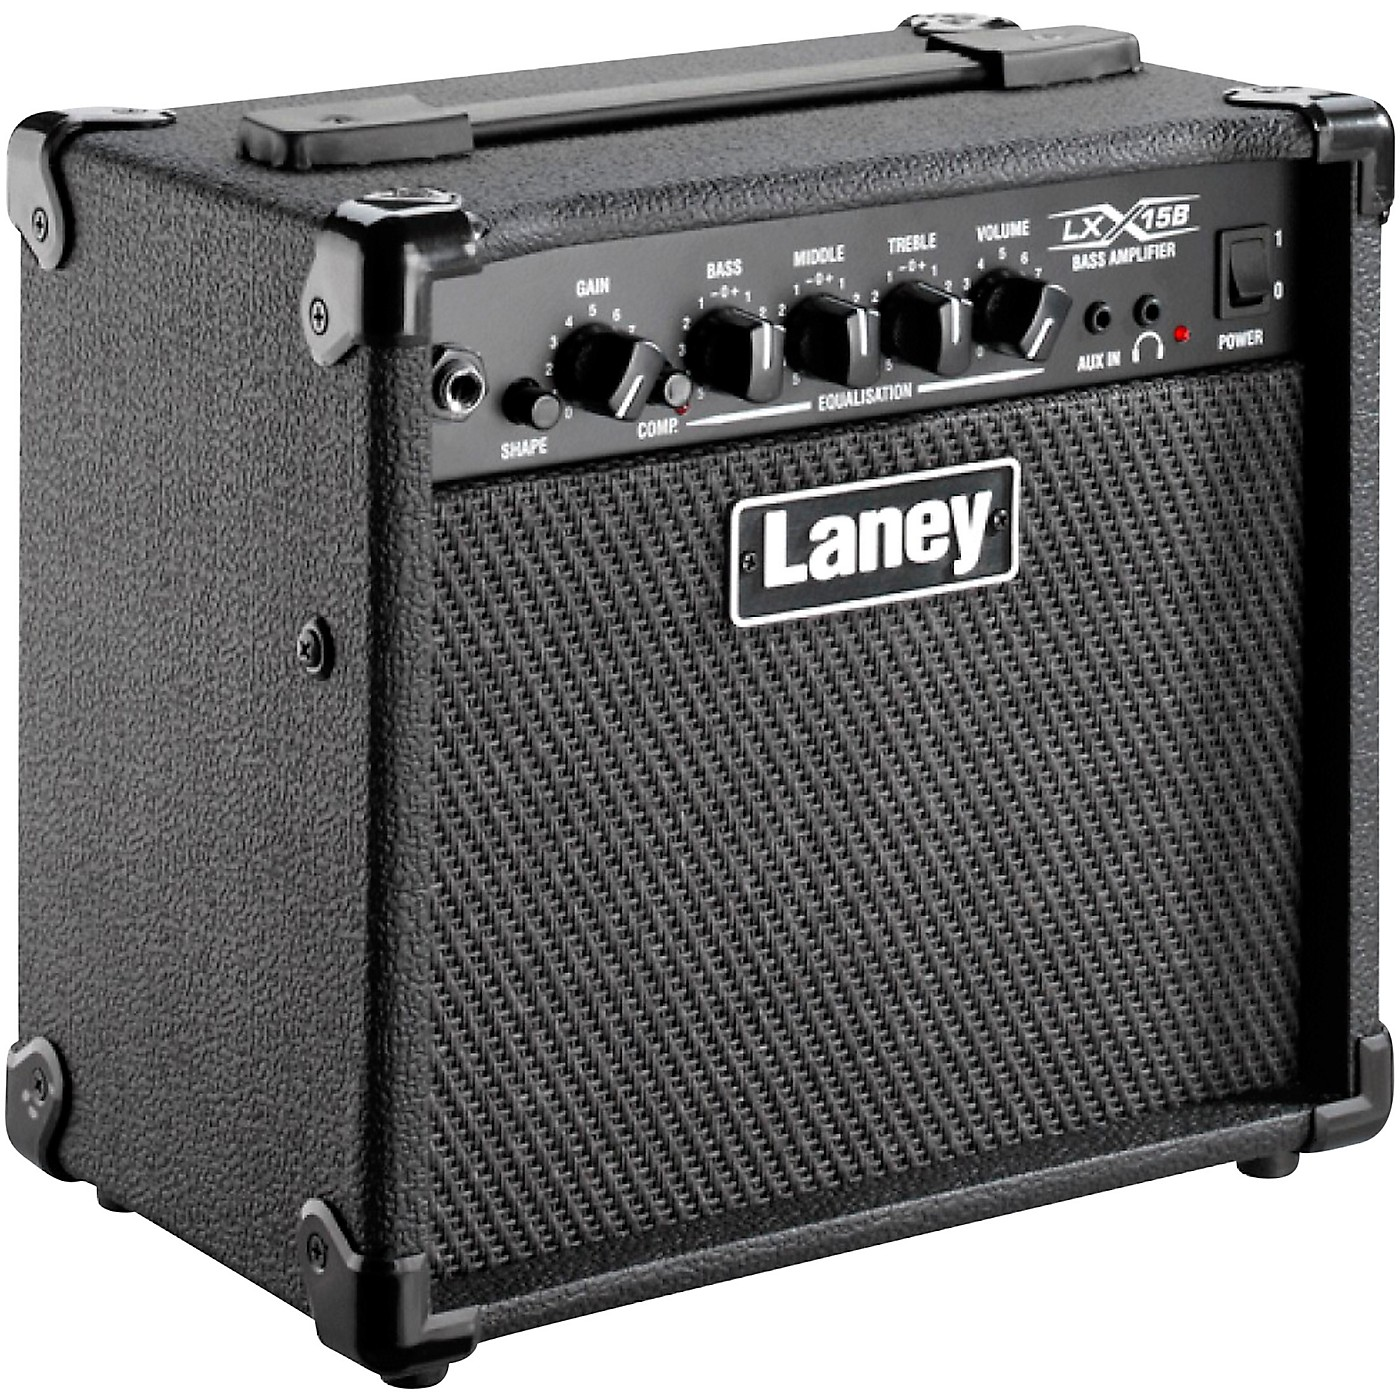 Laney LX15B 15W 2x5 Bass Combo Amp thumbnail